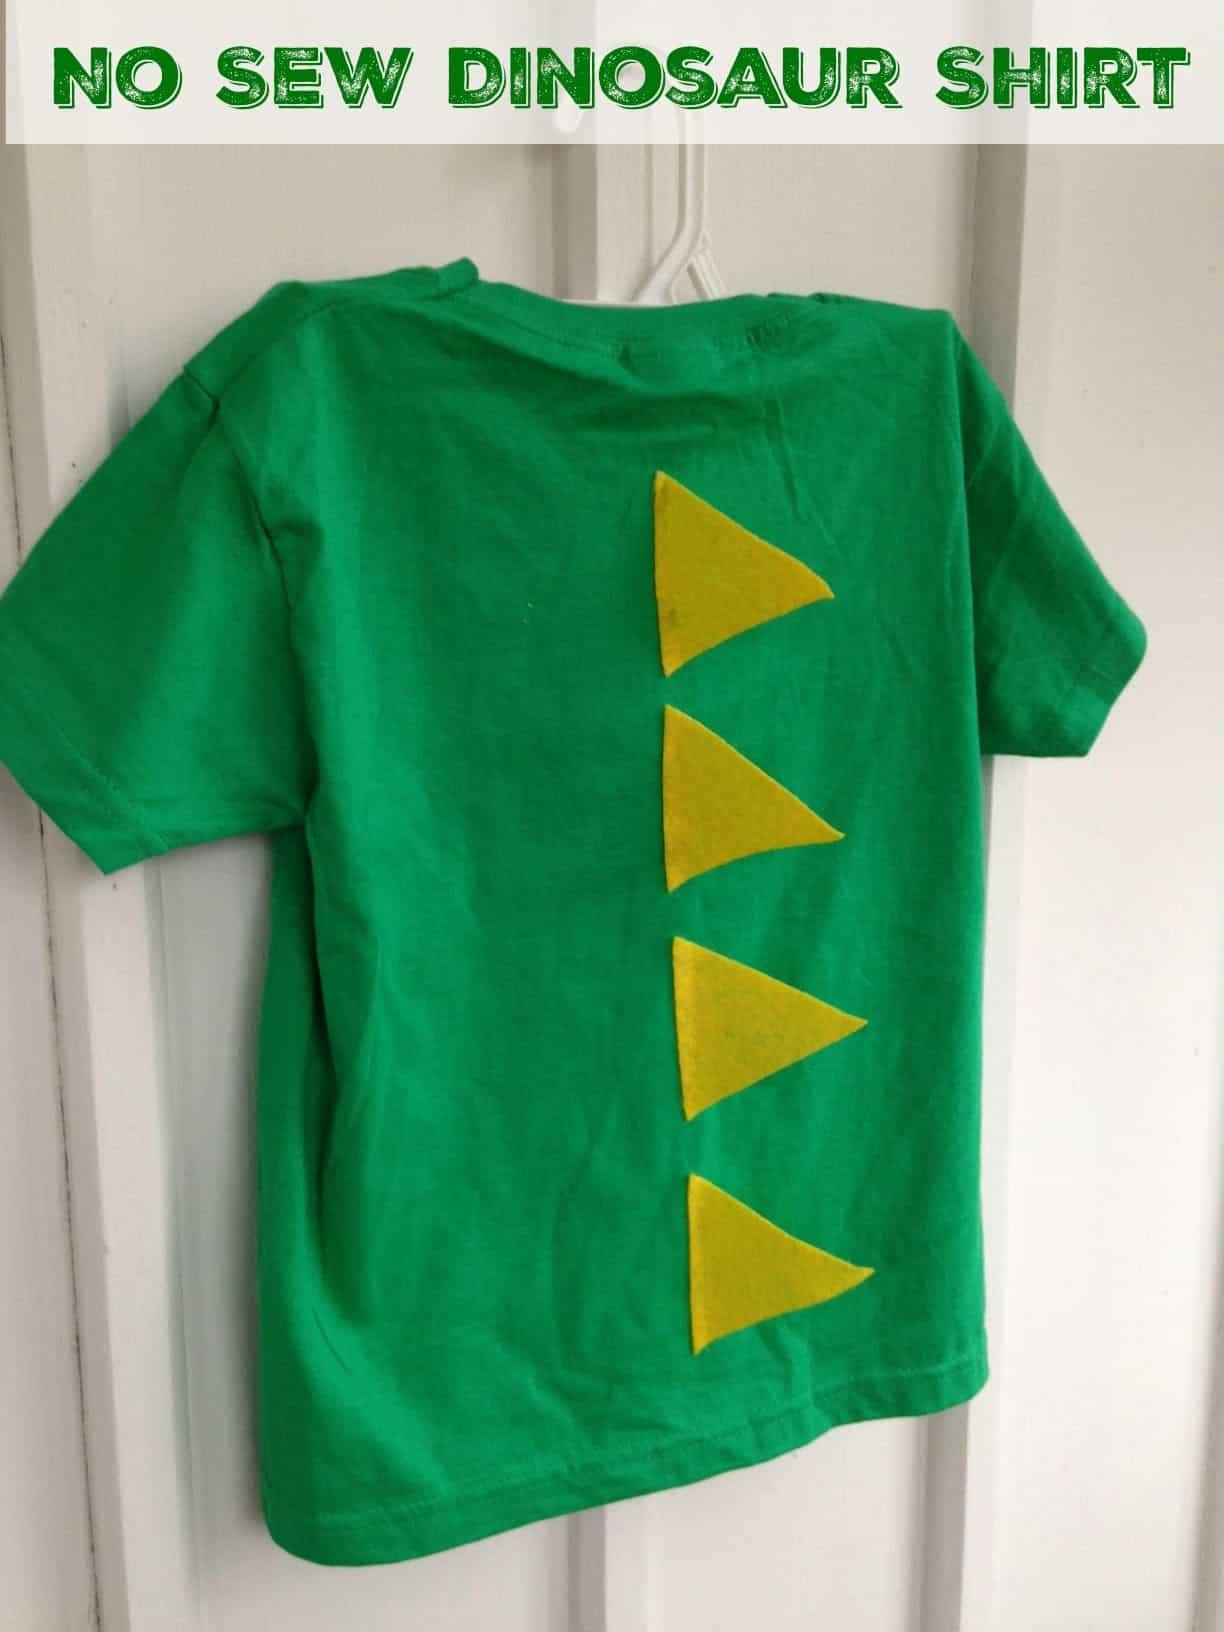 Easy no sew dinosaur shirt! Cute dino t-shirt you can DIY